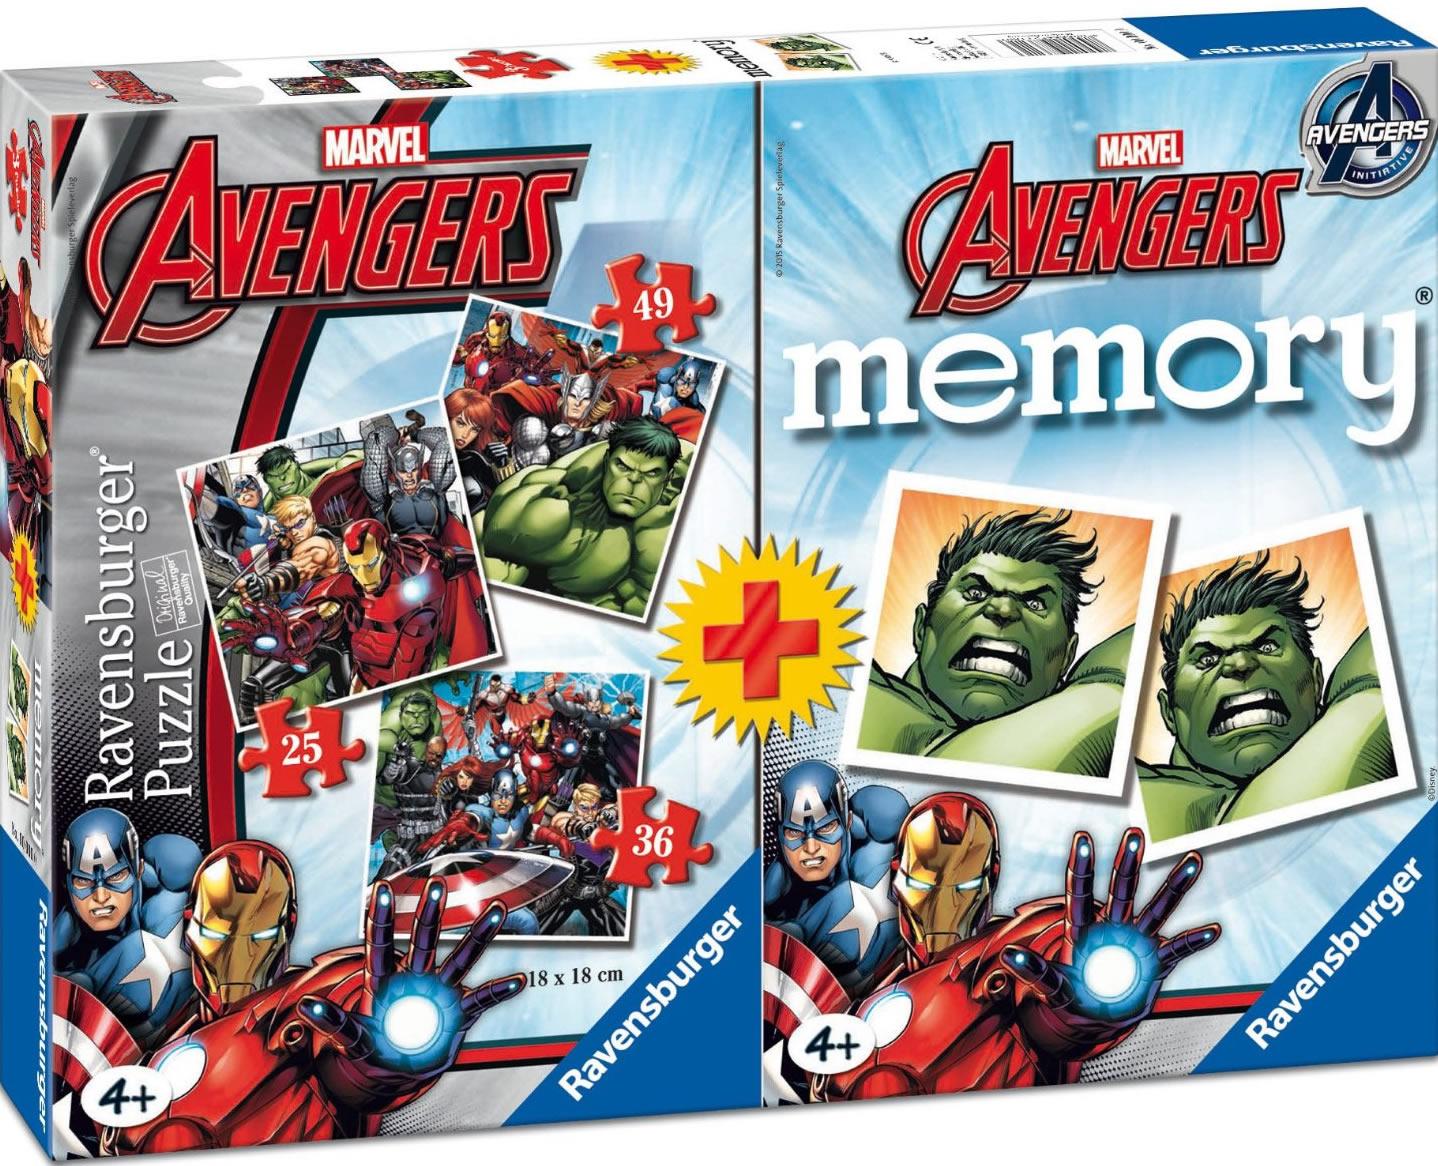 Puzzle Ravensburger Los Vengadores 25+36+49 + Memory